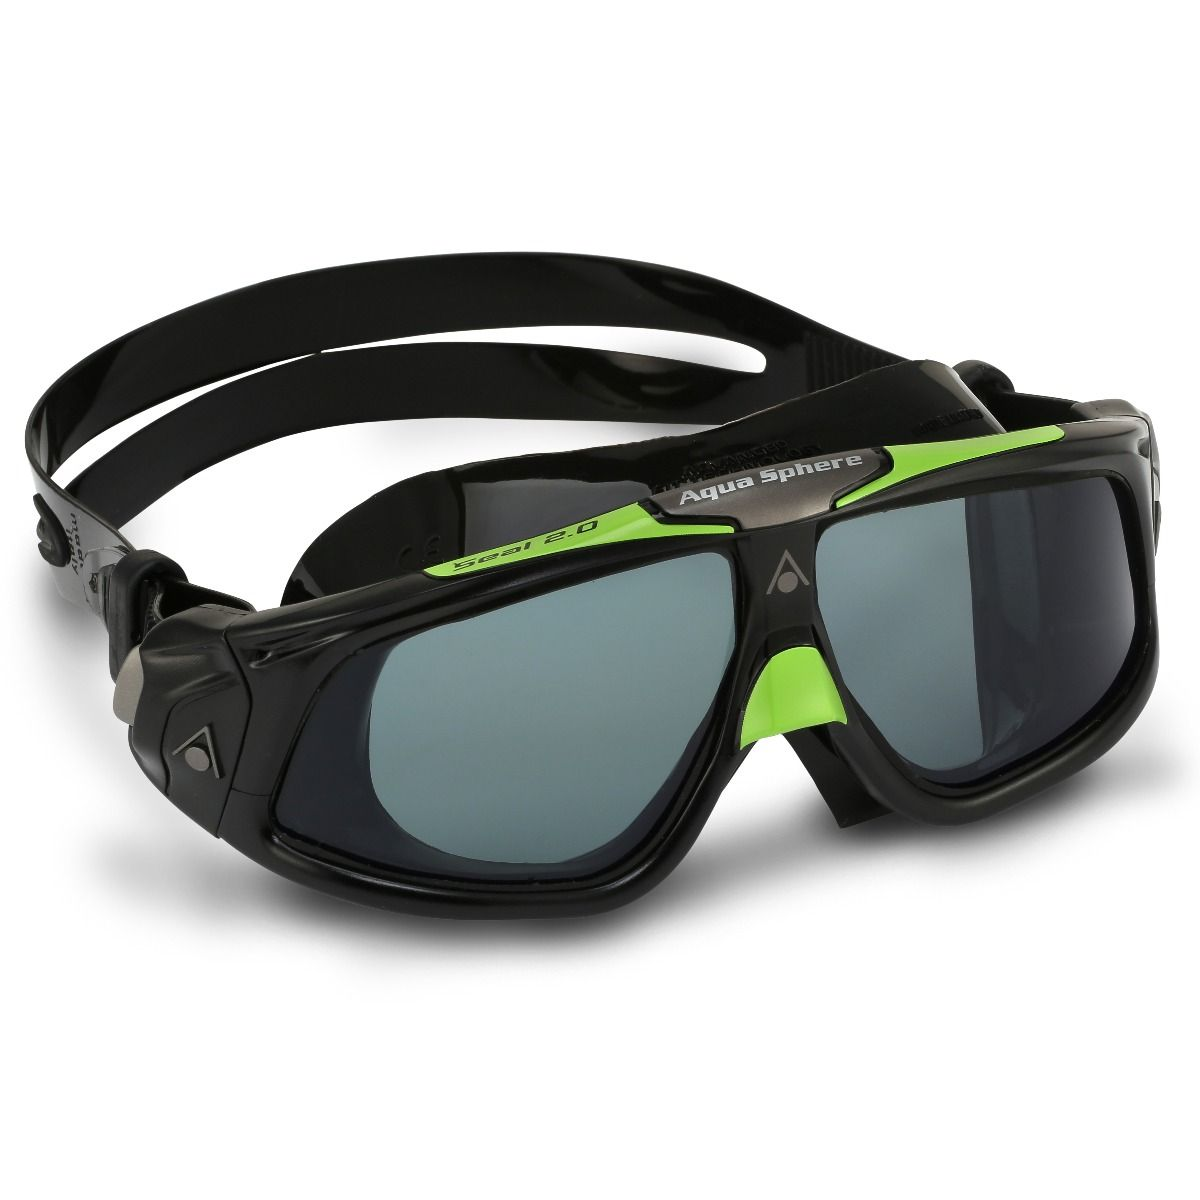 0f17c8475f9 Aqua sphere seal tinted lens swimming goggles swimspace jpg 1200x1200 Aqua  swimming goggles